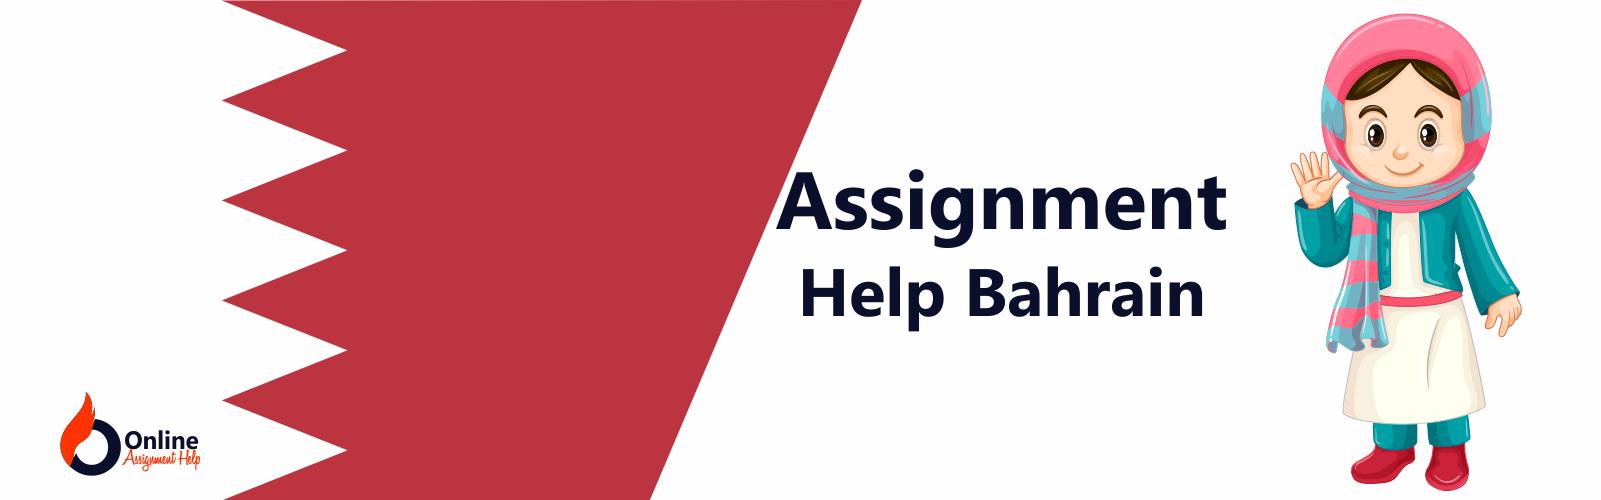 Assignment Help Bahrain